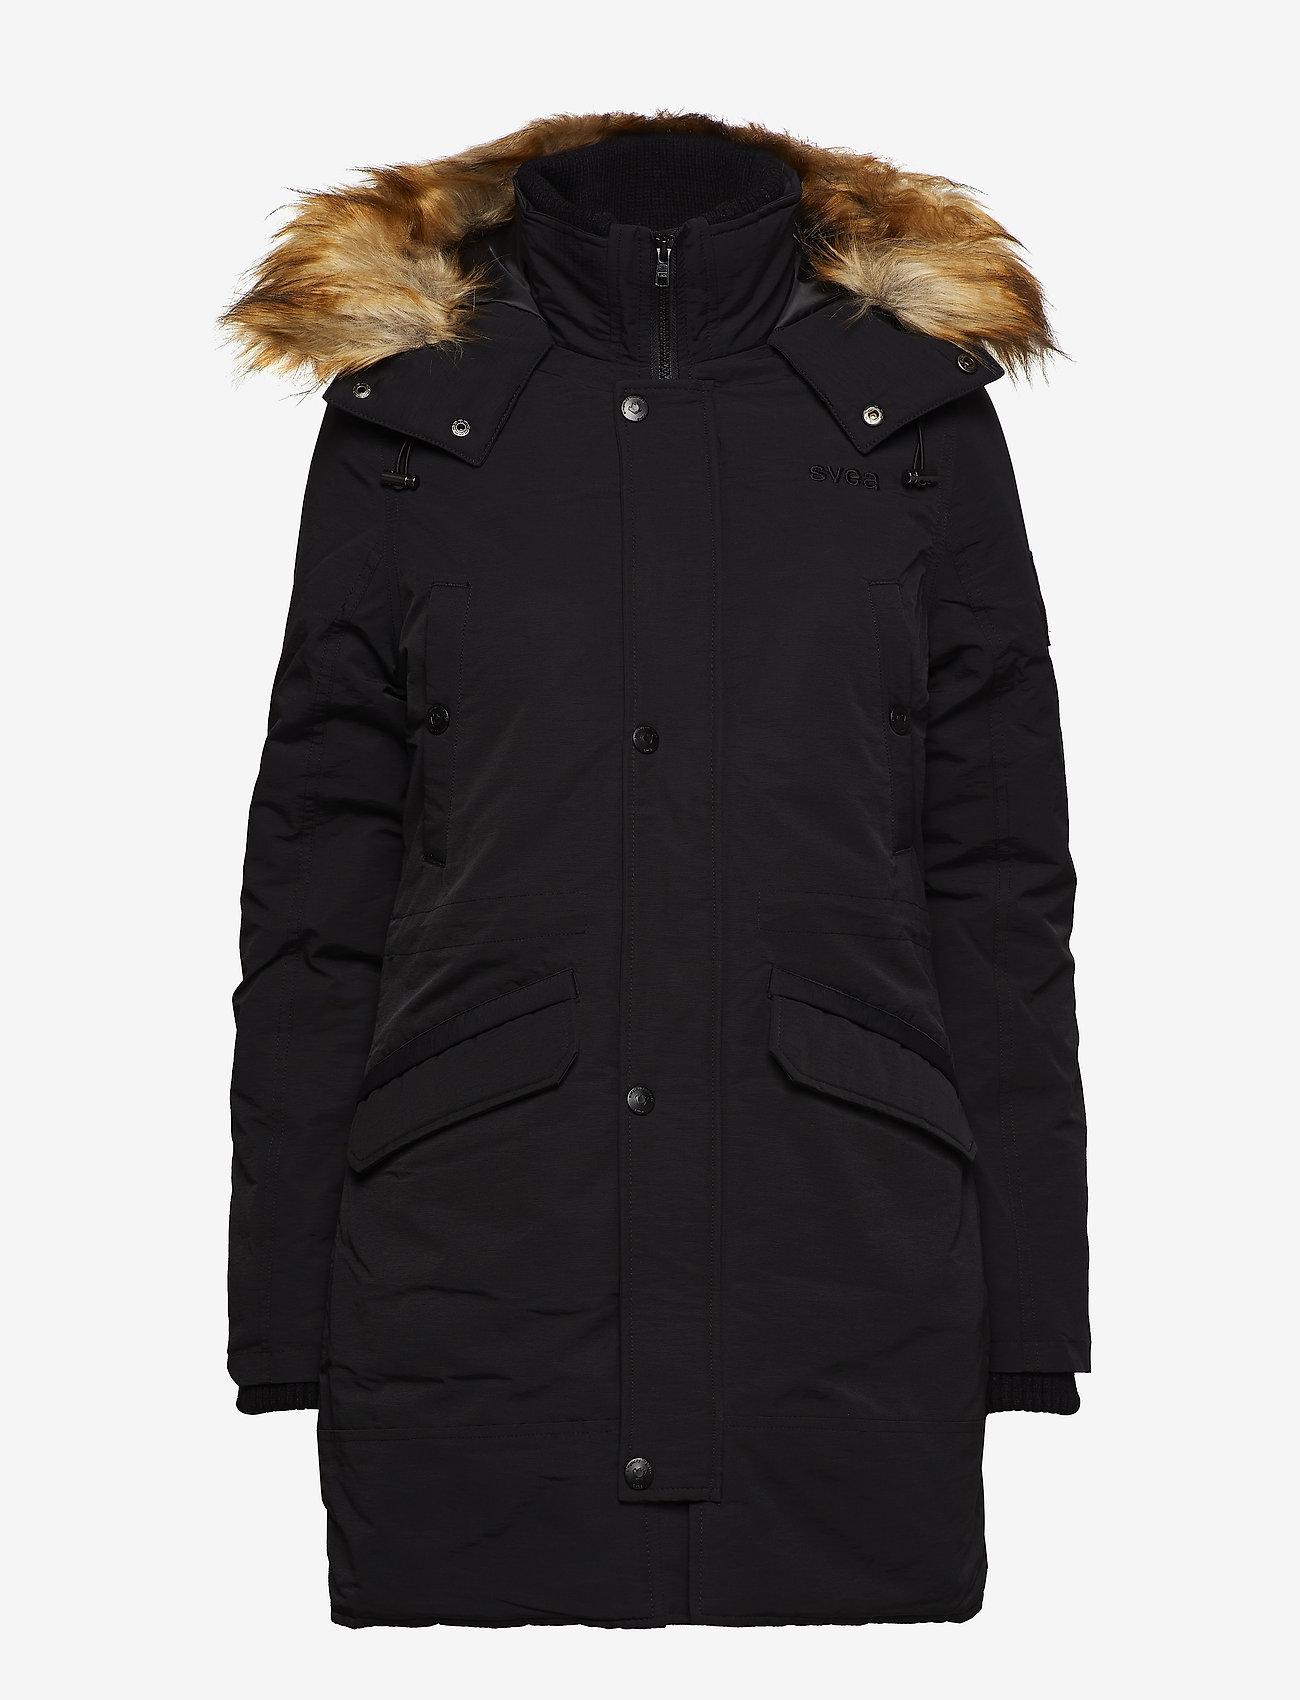 Aline Jacket   - Svea -  Women's Jackets & Coats Big Sale